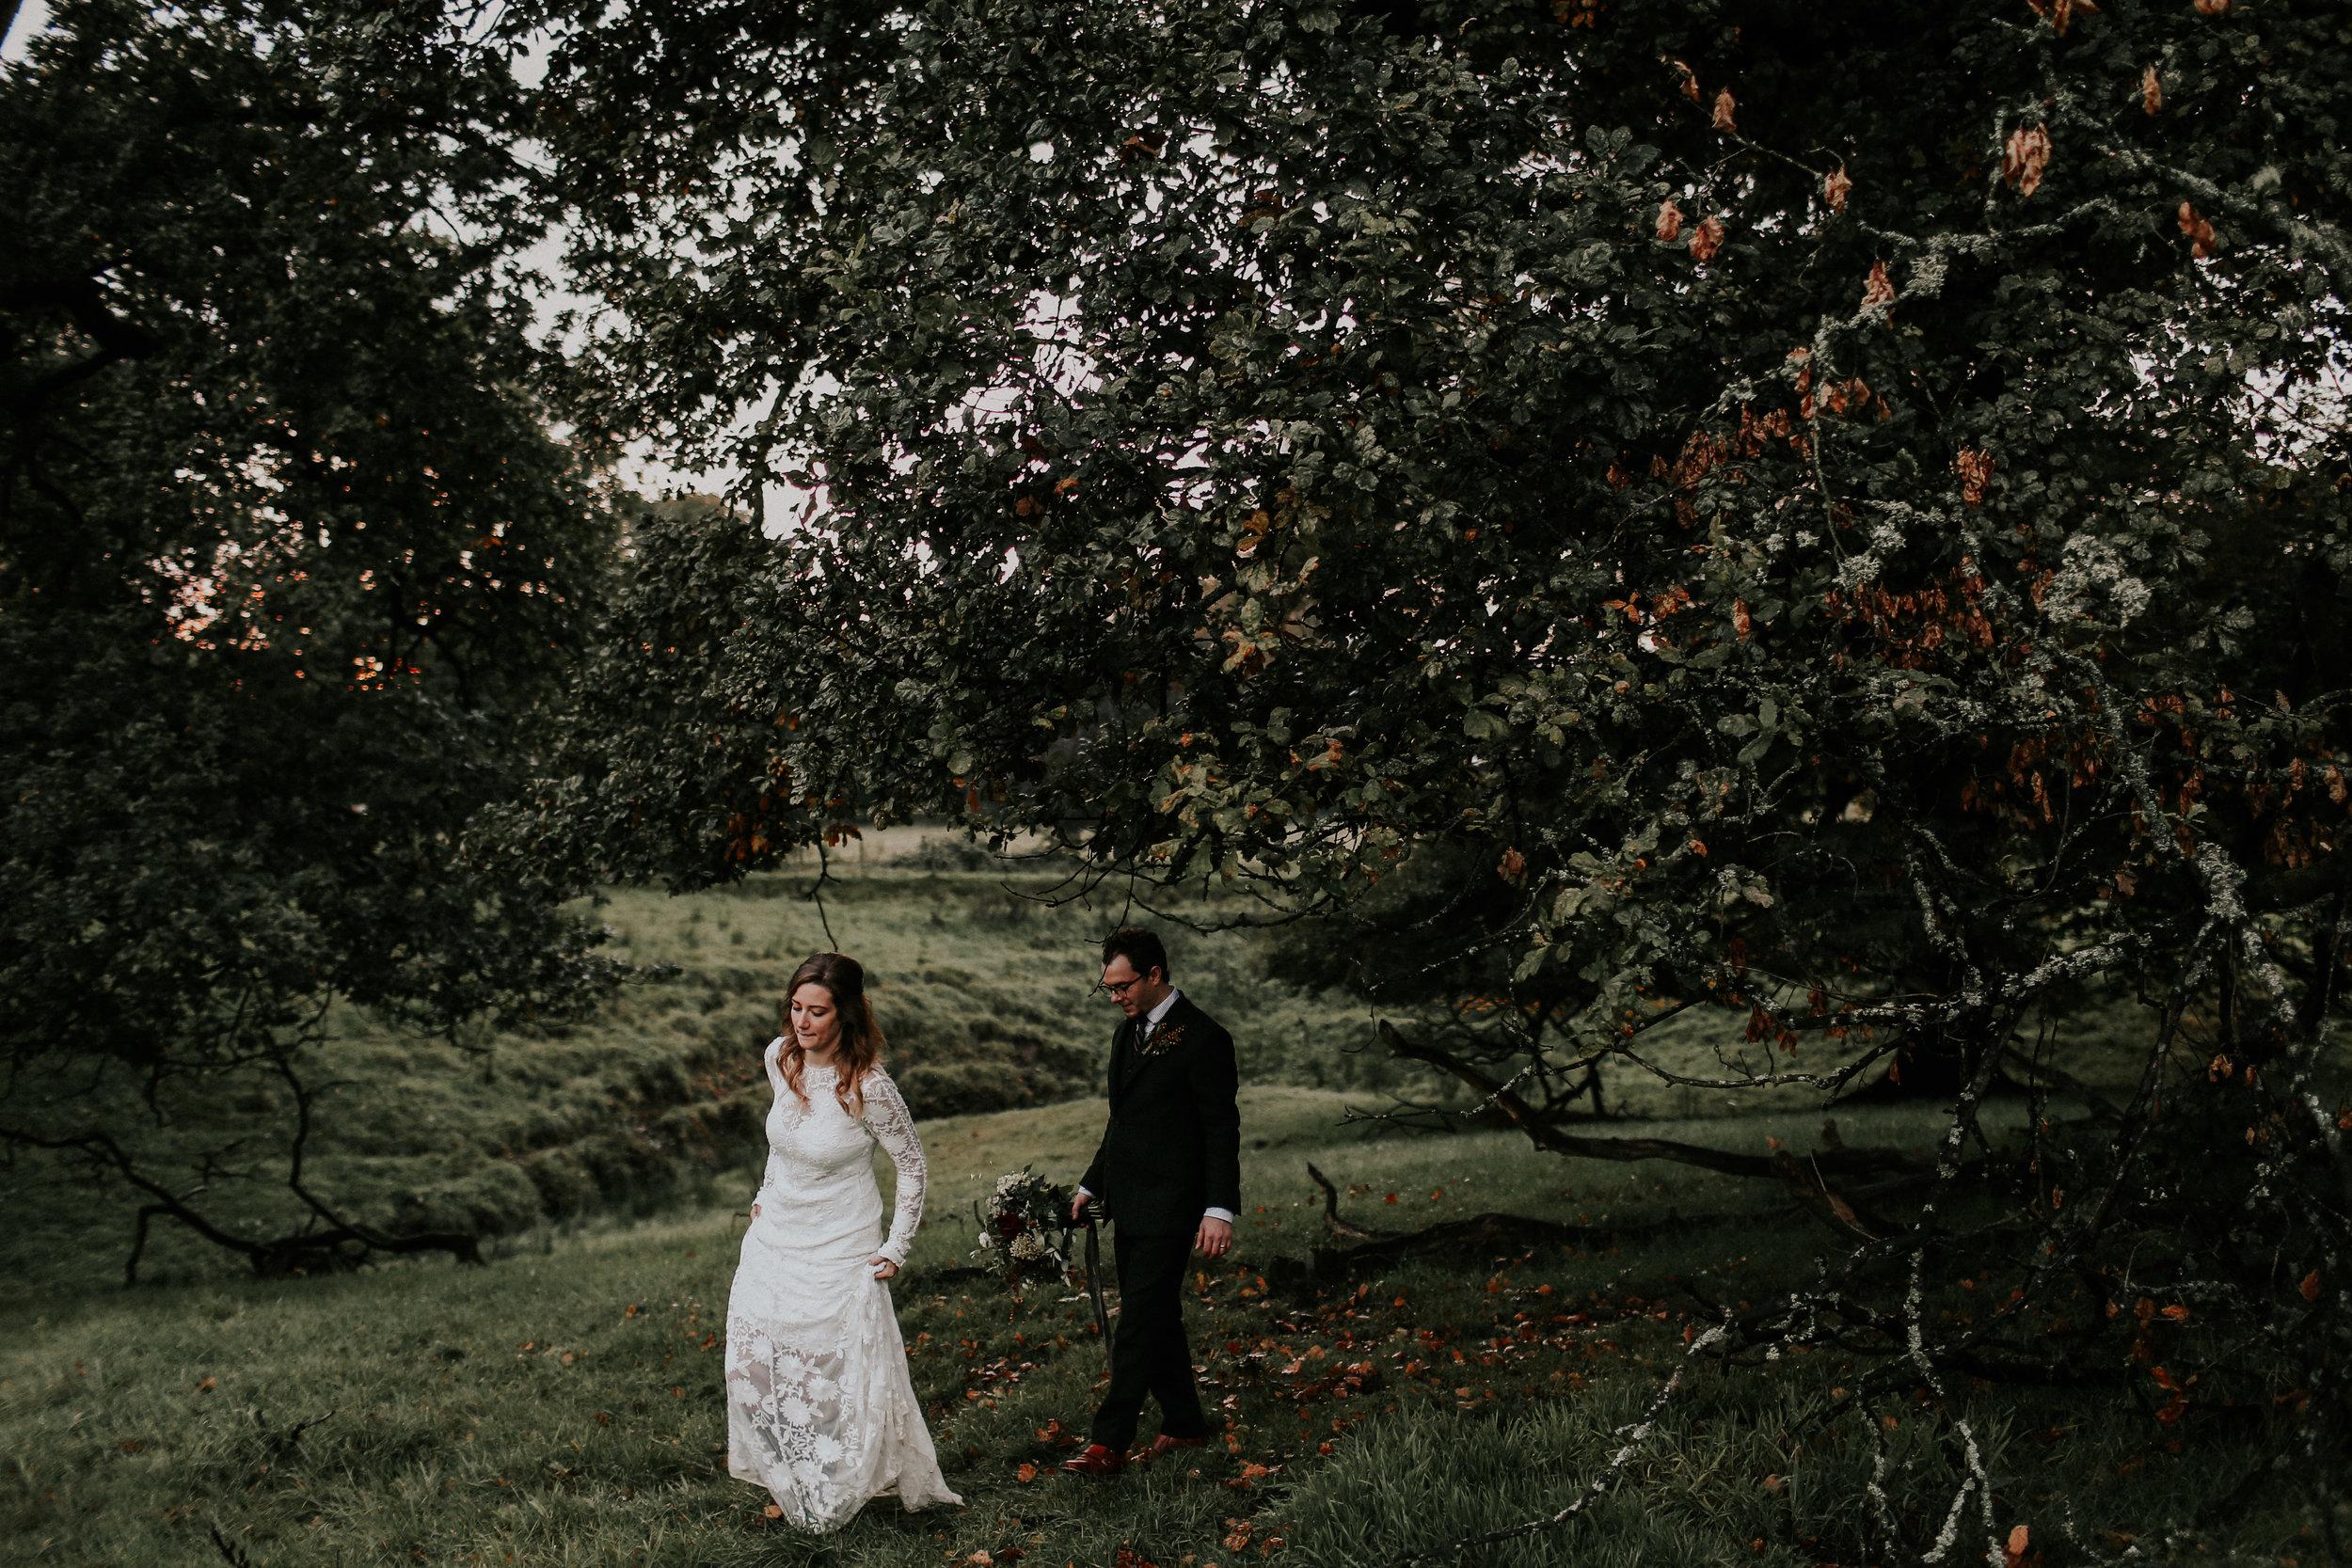 Scotland_Elopement_Melissa_Marshall_Photography_56.jpg